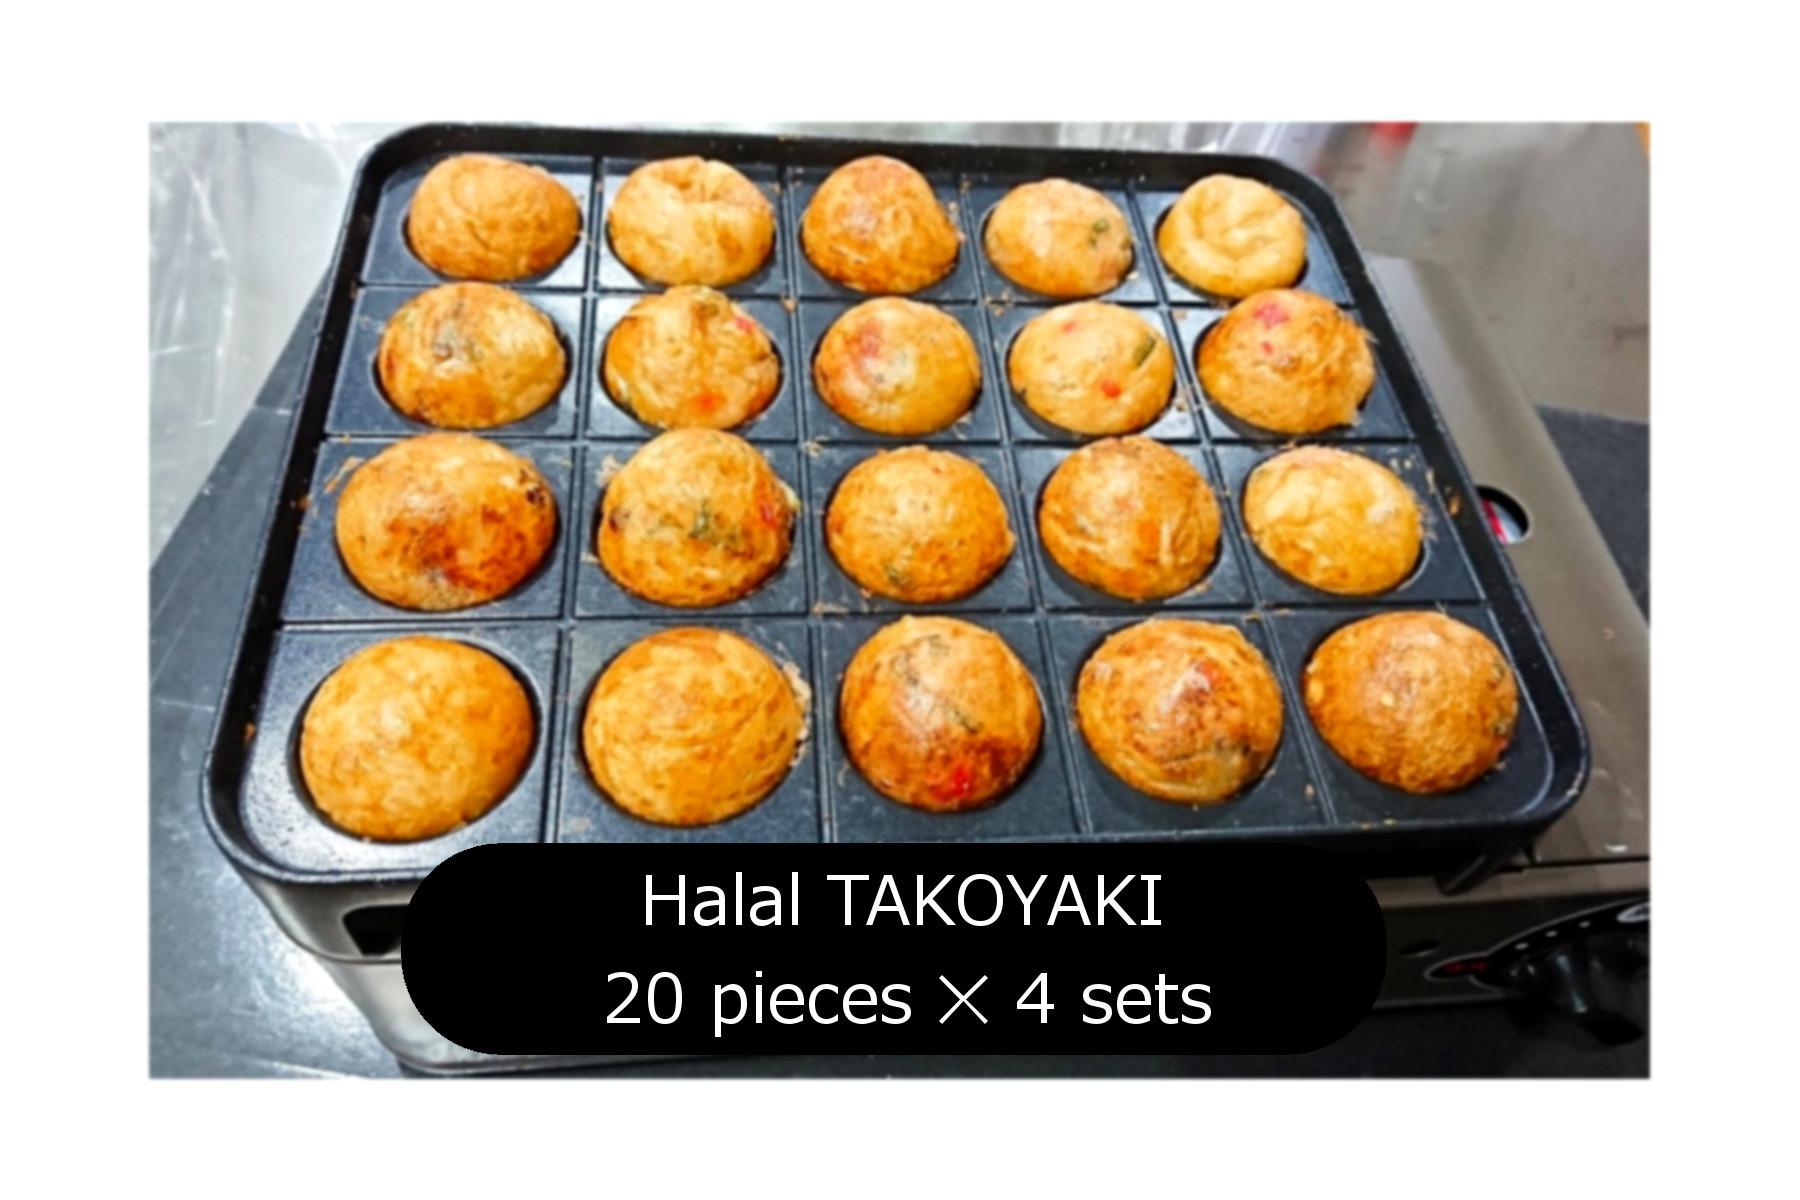 Halal TAKOYAKI Serves 4